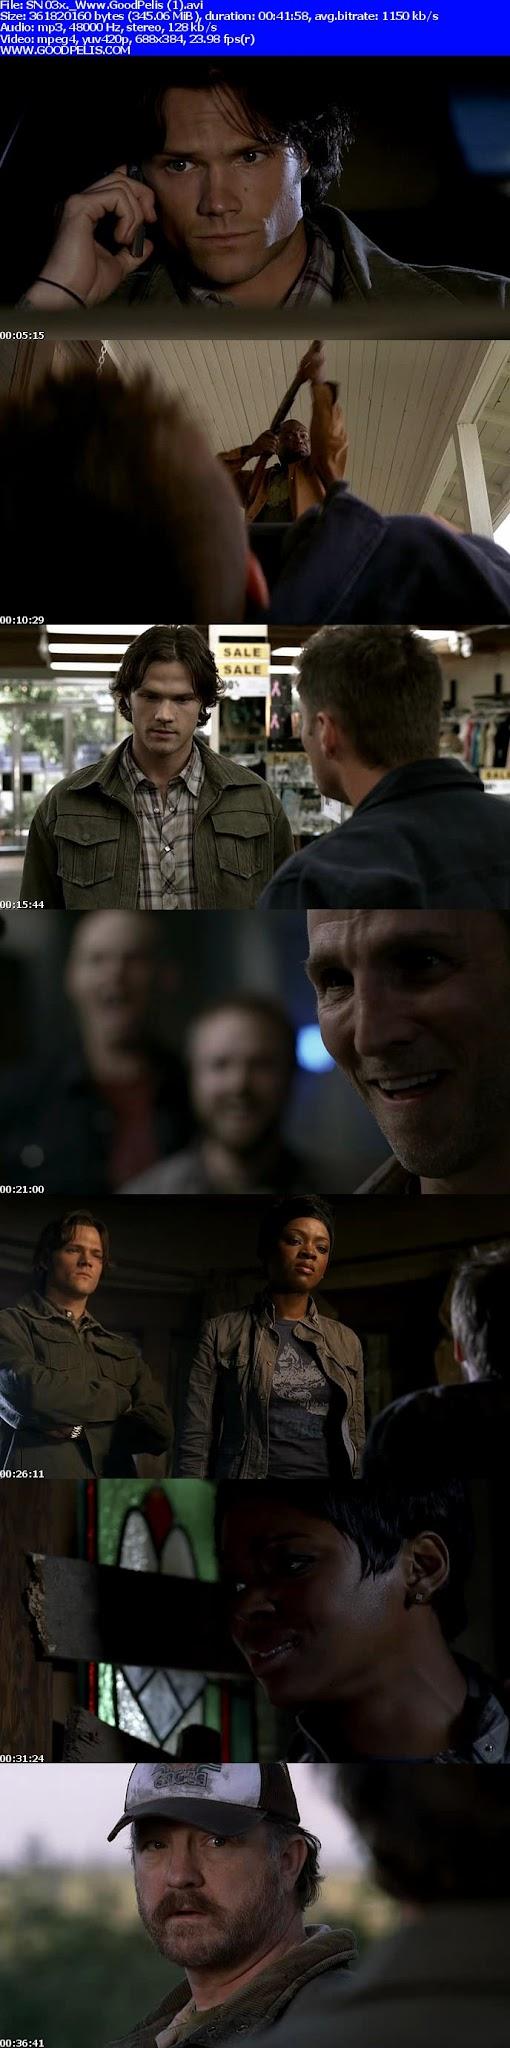 Arrow temporada 2 capitulo 22 online dating 6